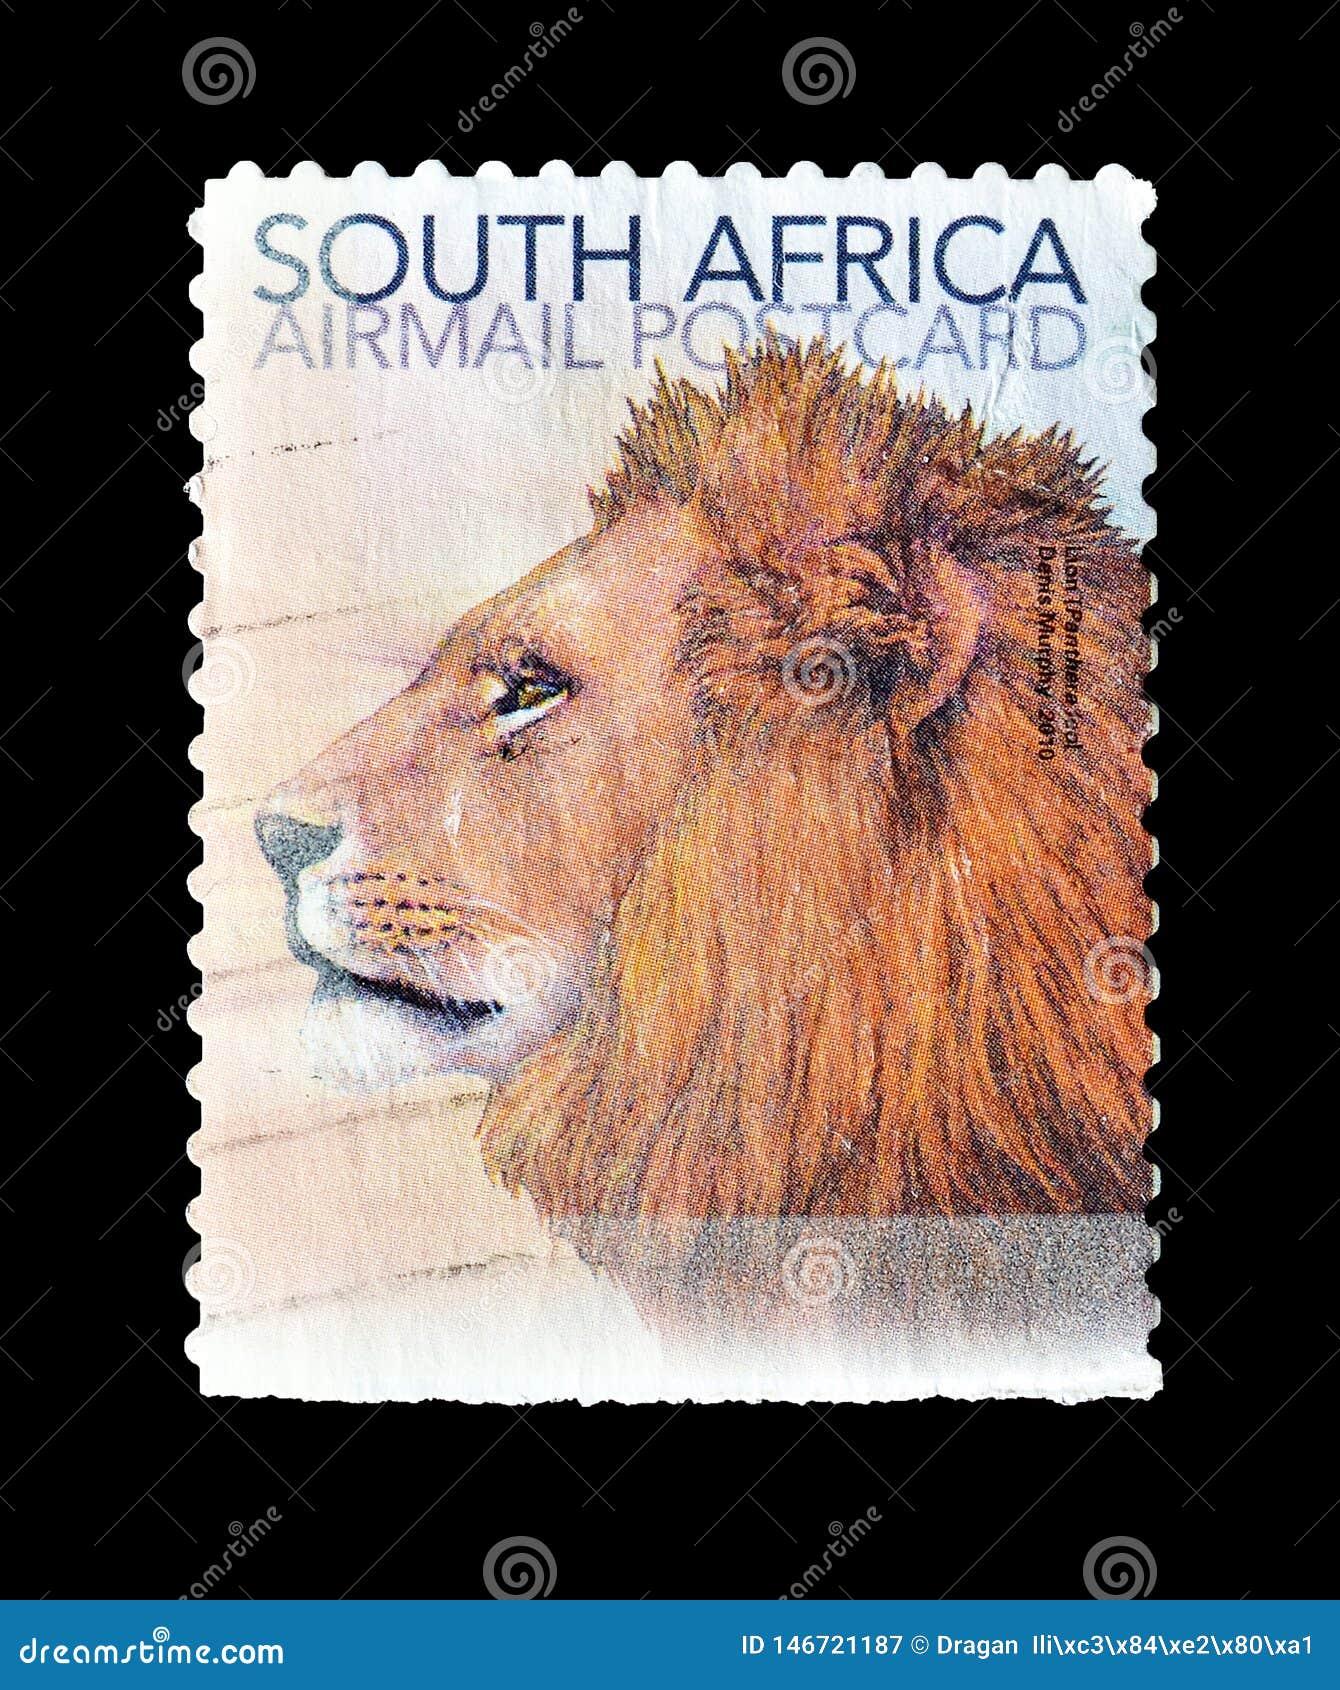 Animali selvatici sui francobolli